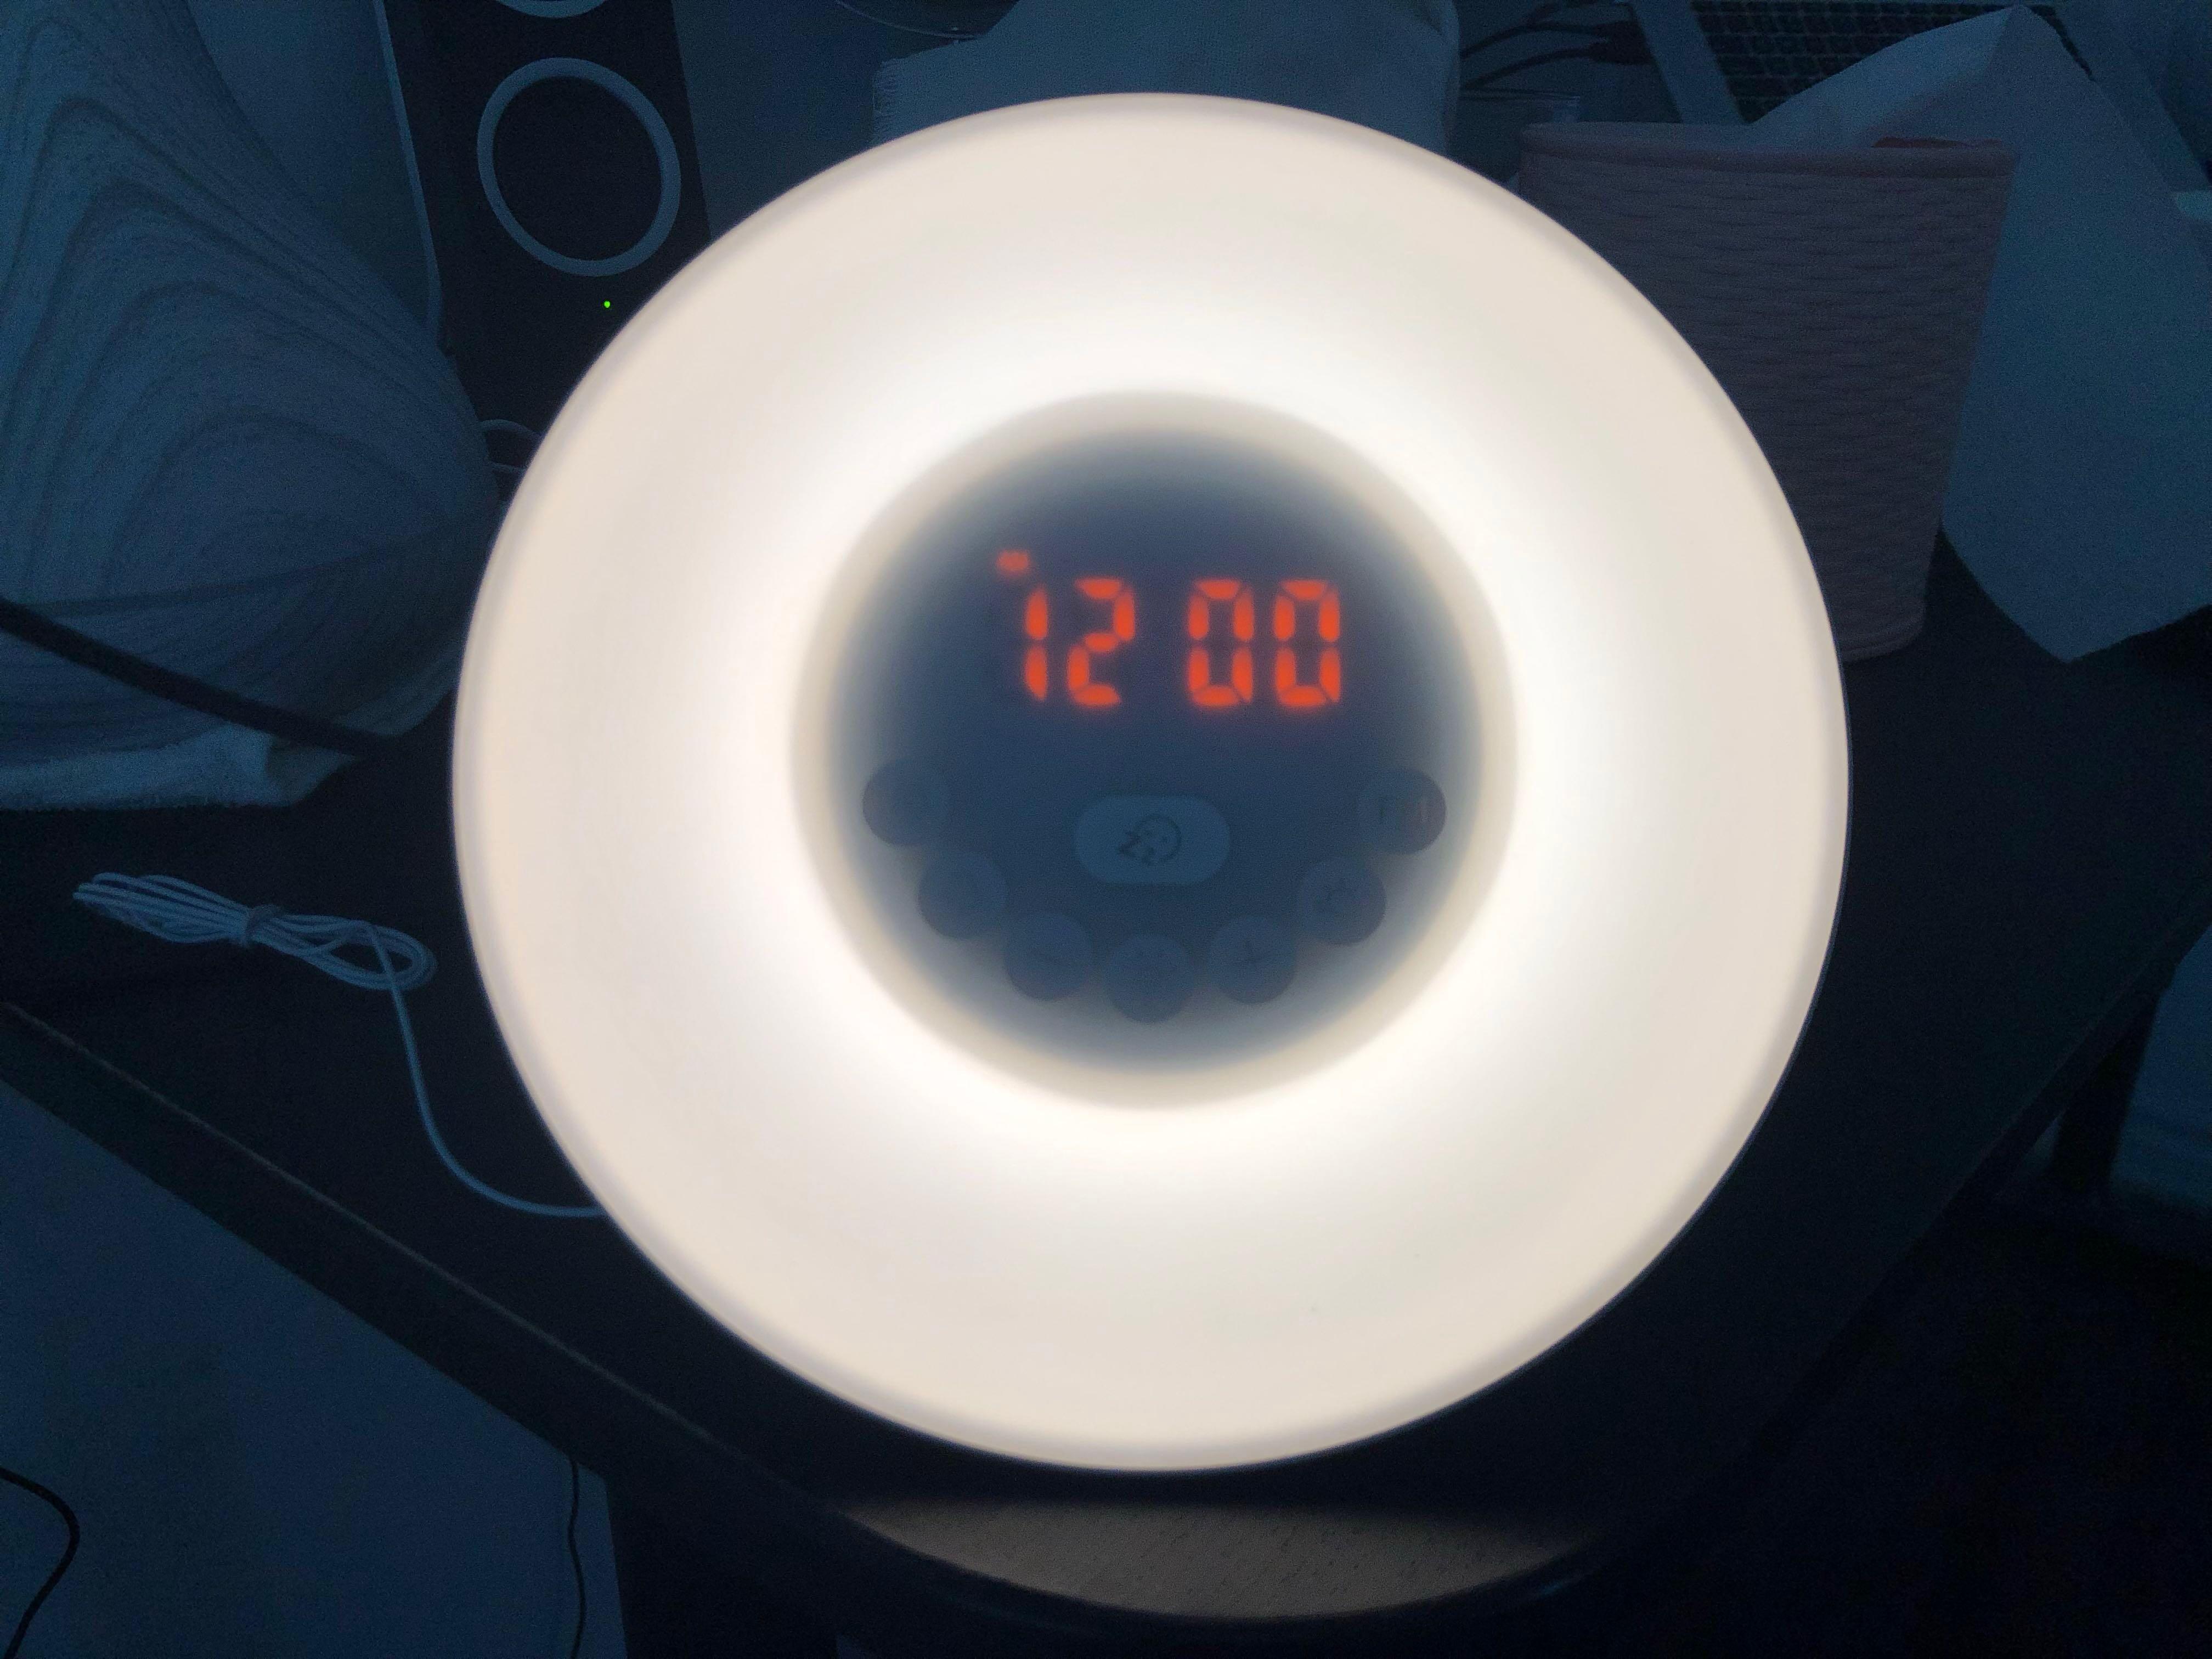 Wake up light alarm clock fm radio - brand new